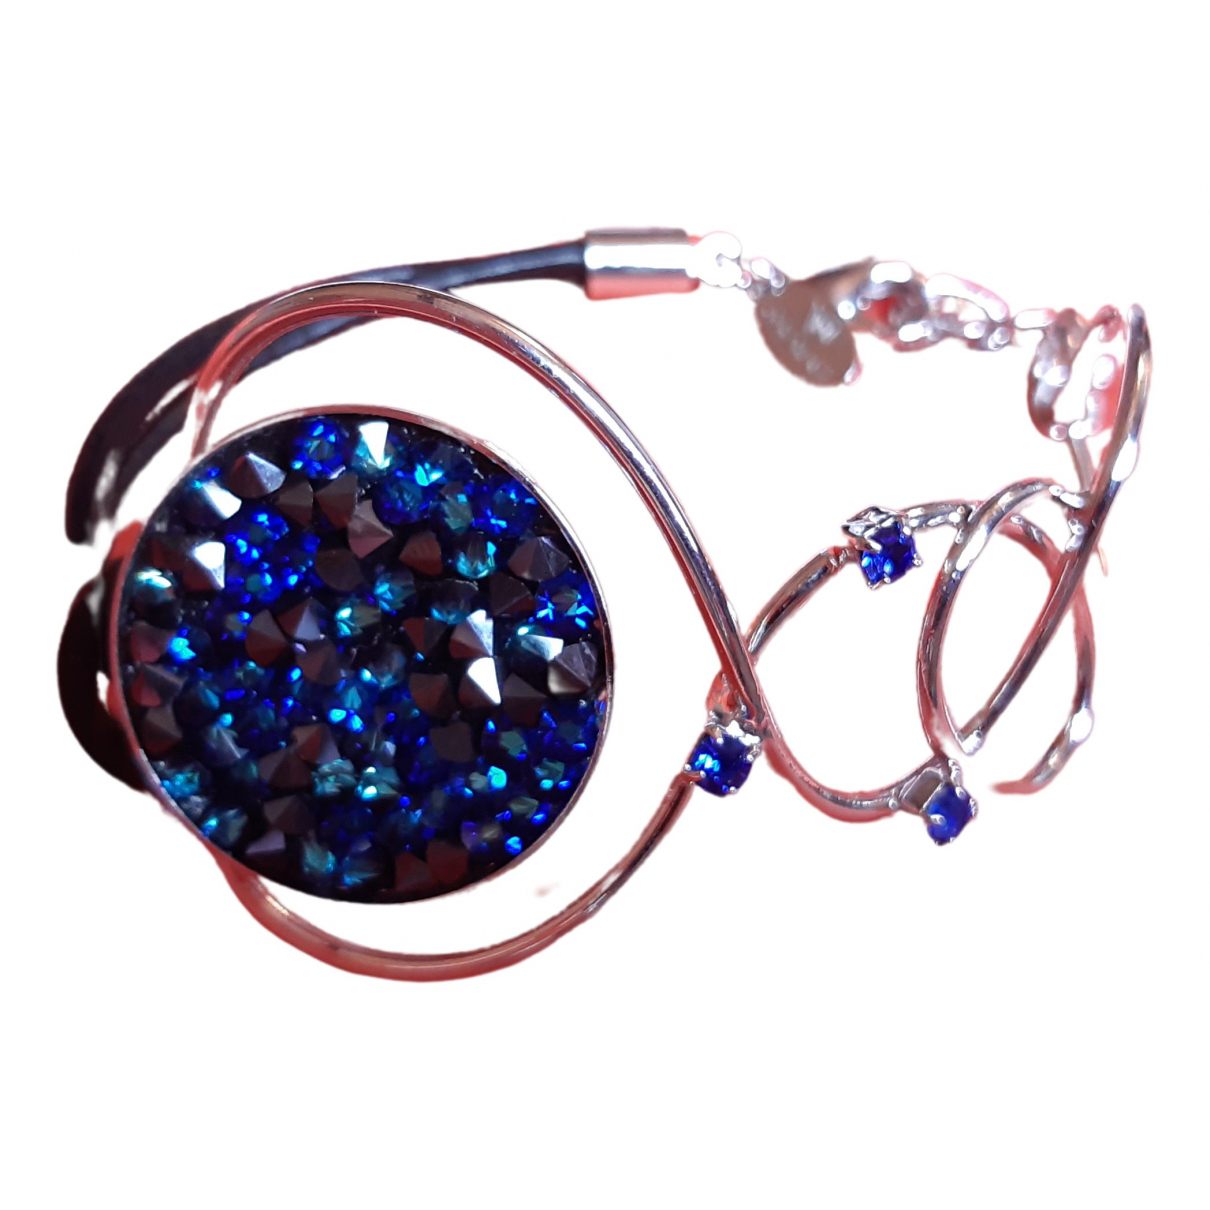 Non Signe / Unsigned Art Deco Armband in  Blau Metall